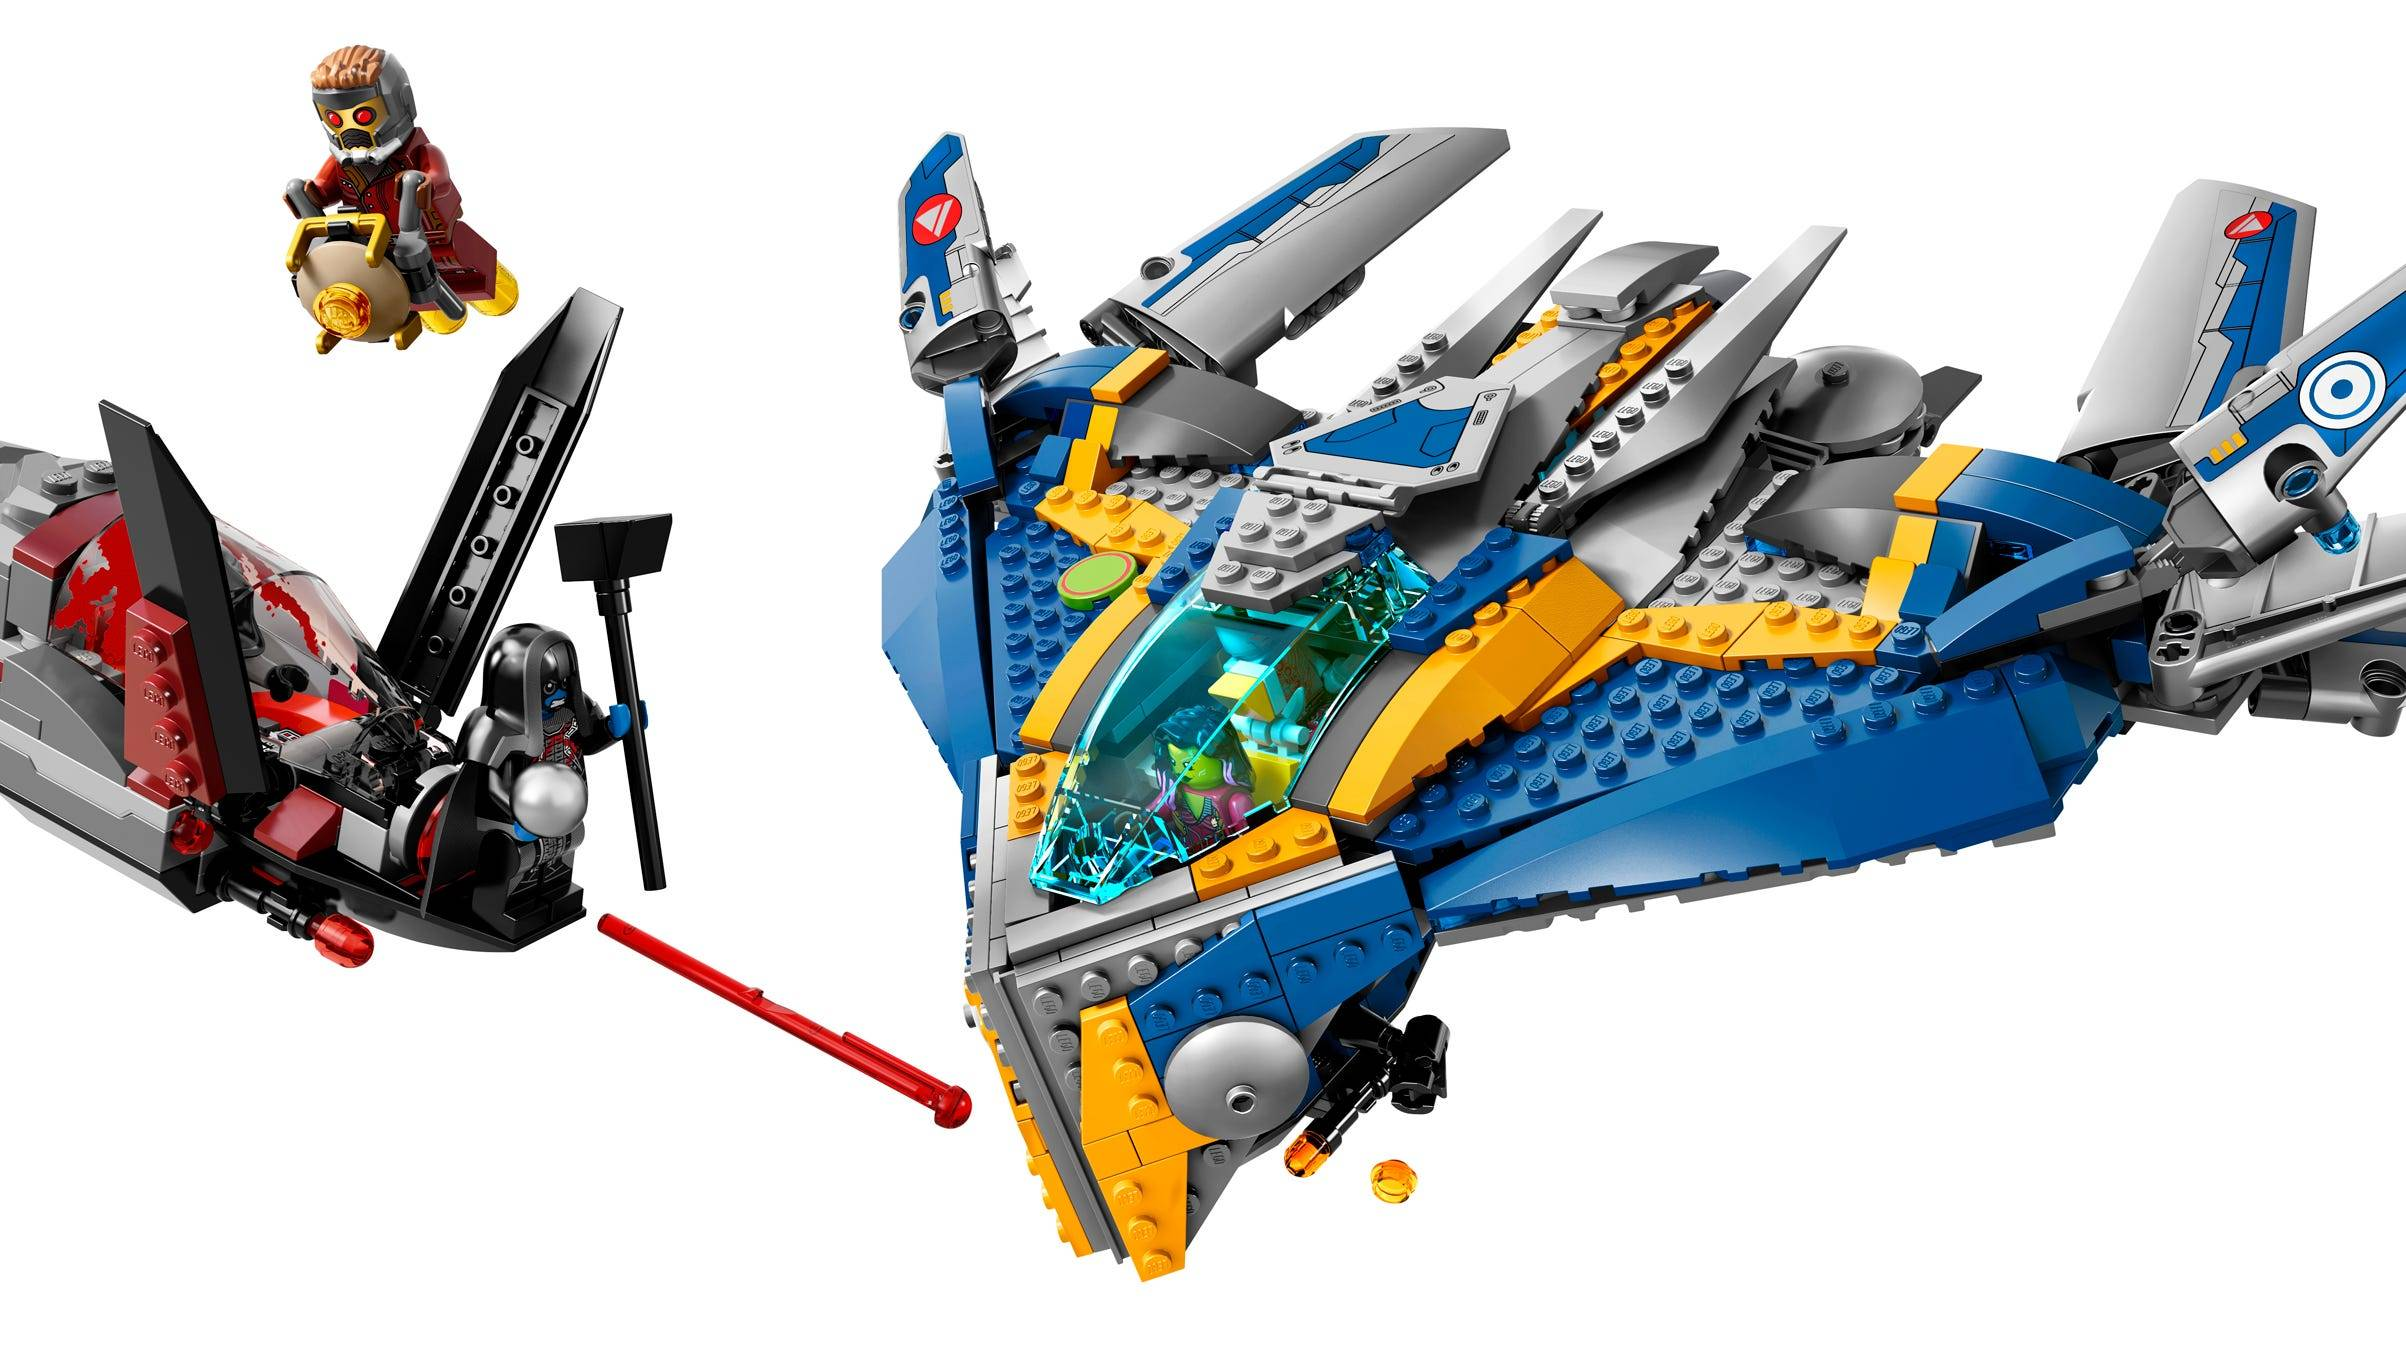 The Guardians' spacecraft set